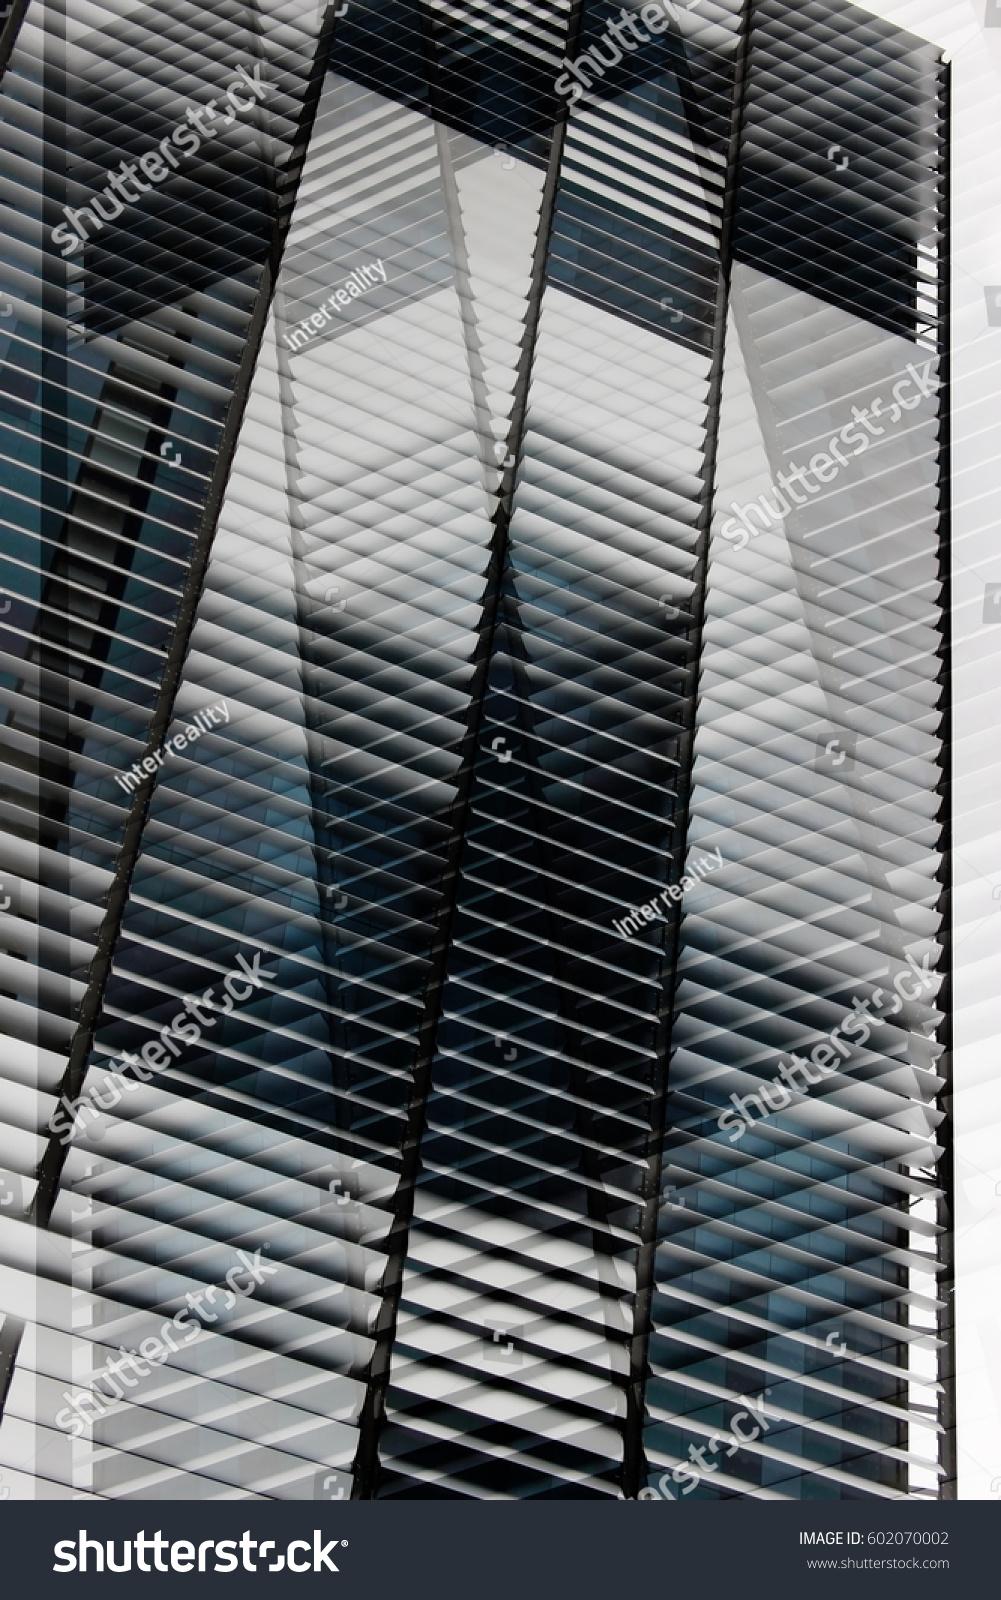 louvered structure reworked tilt photo ajar stock photo 602070002 shutterstock. Black Bedroom Furniture Sets. Home Design Ideas